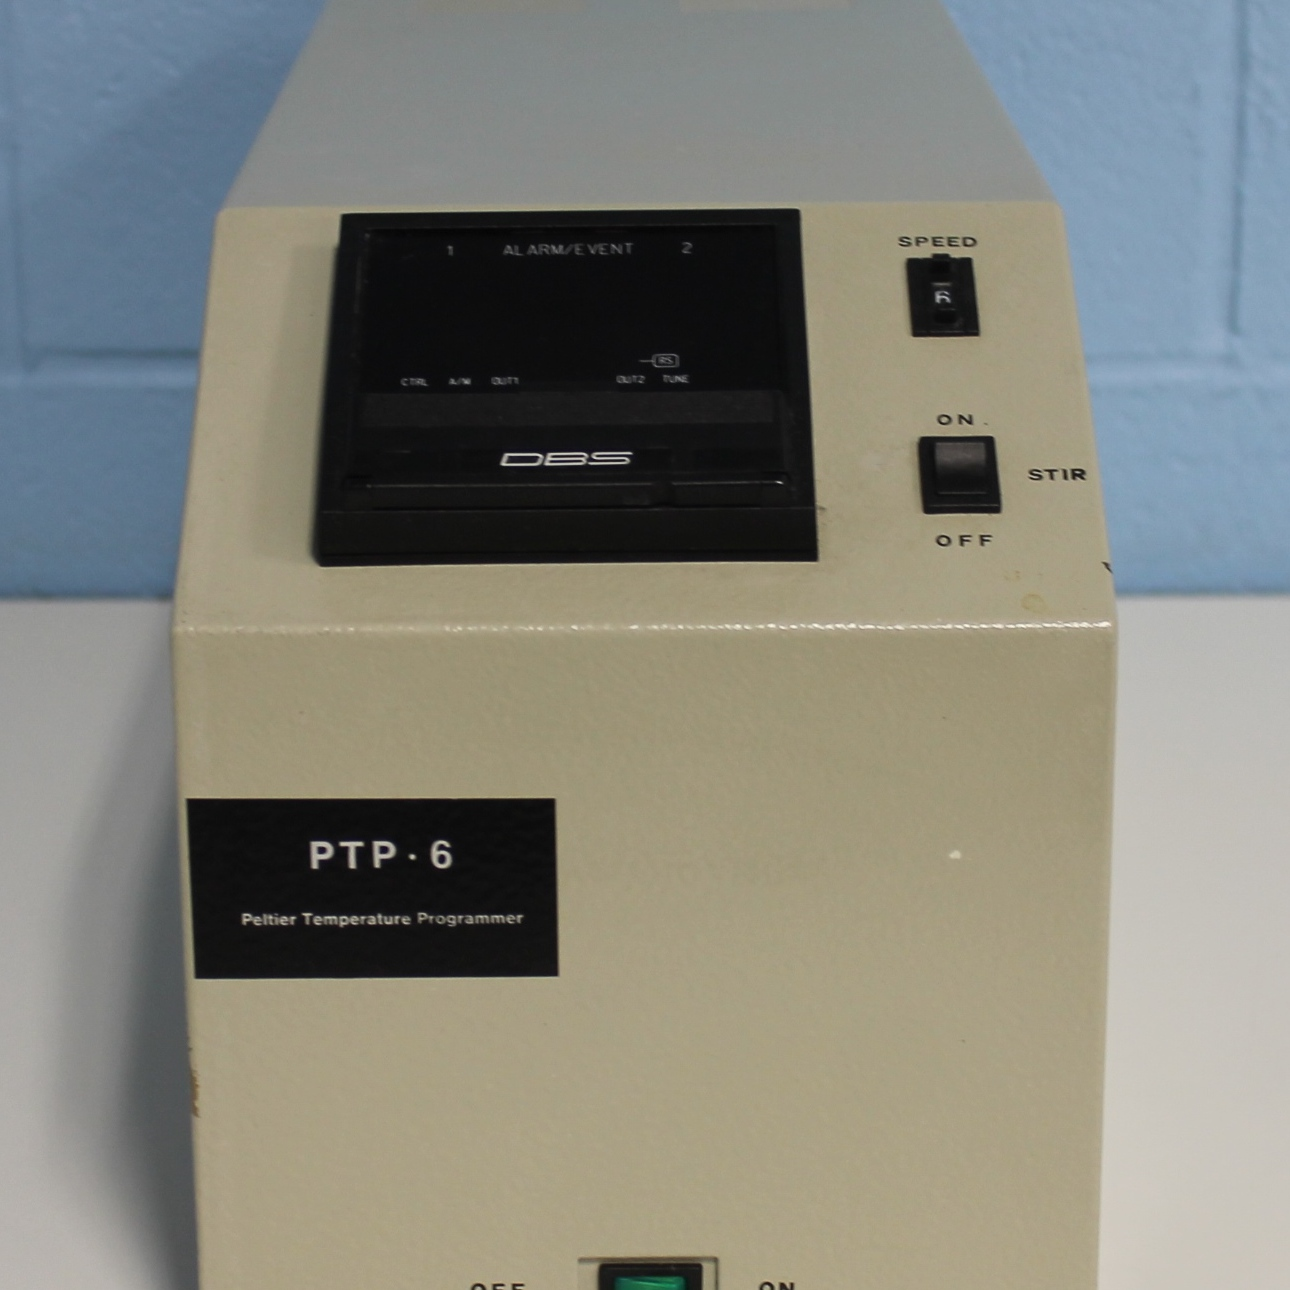 Perkin Elmer D.B.S PTP-6 Peltier Temperature Programmer Image